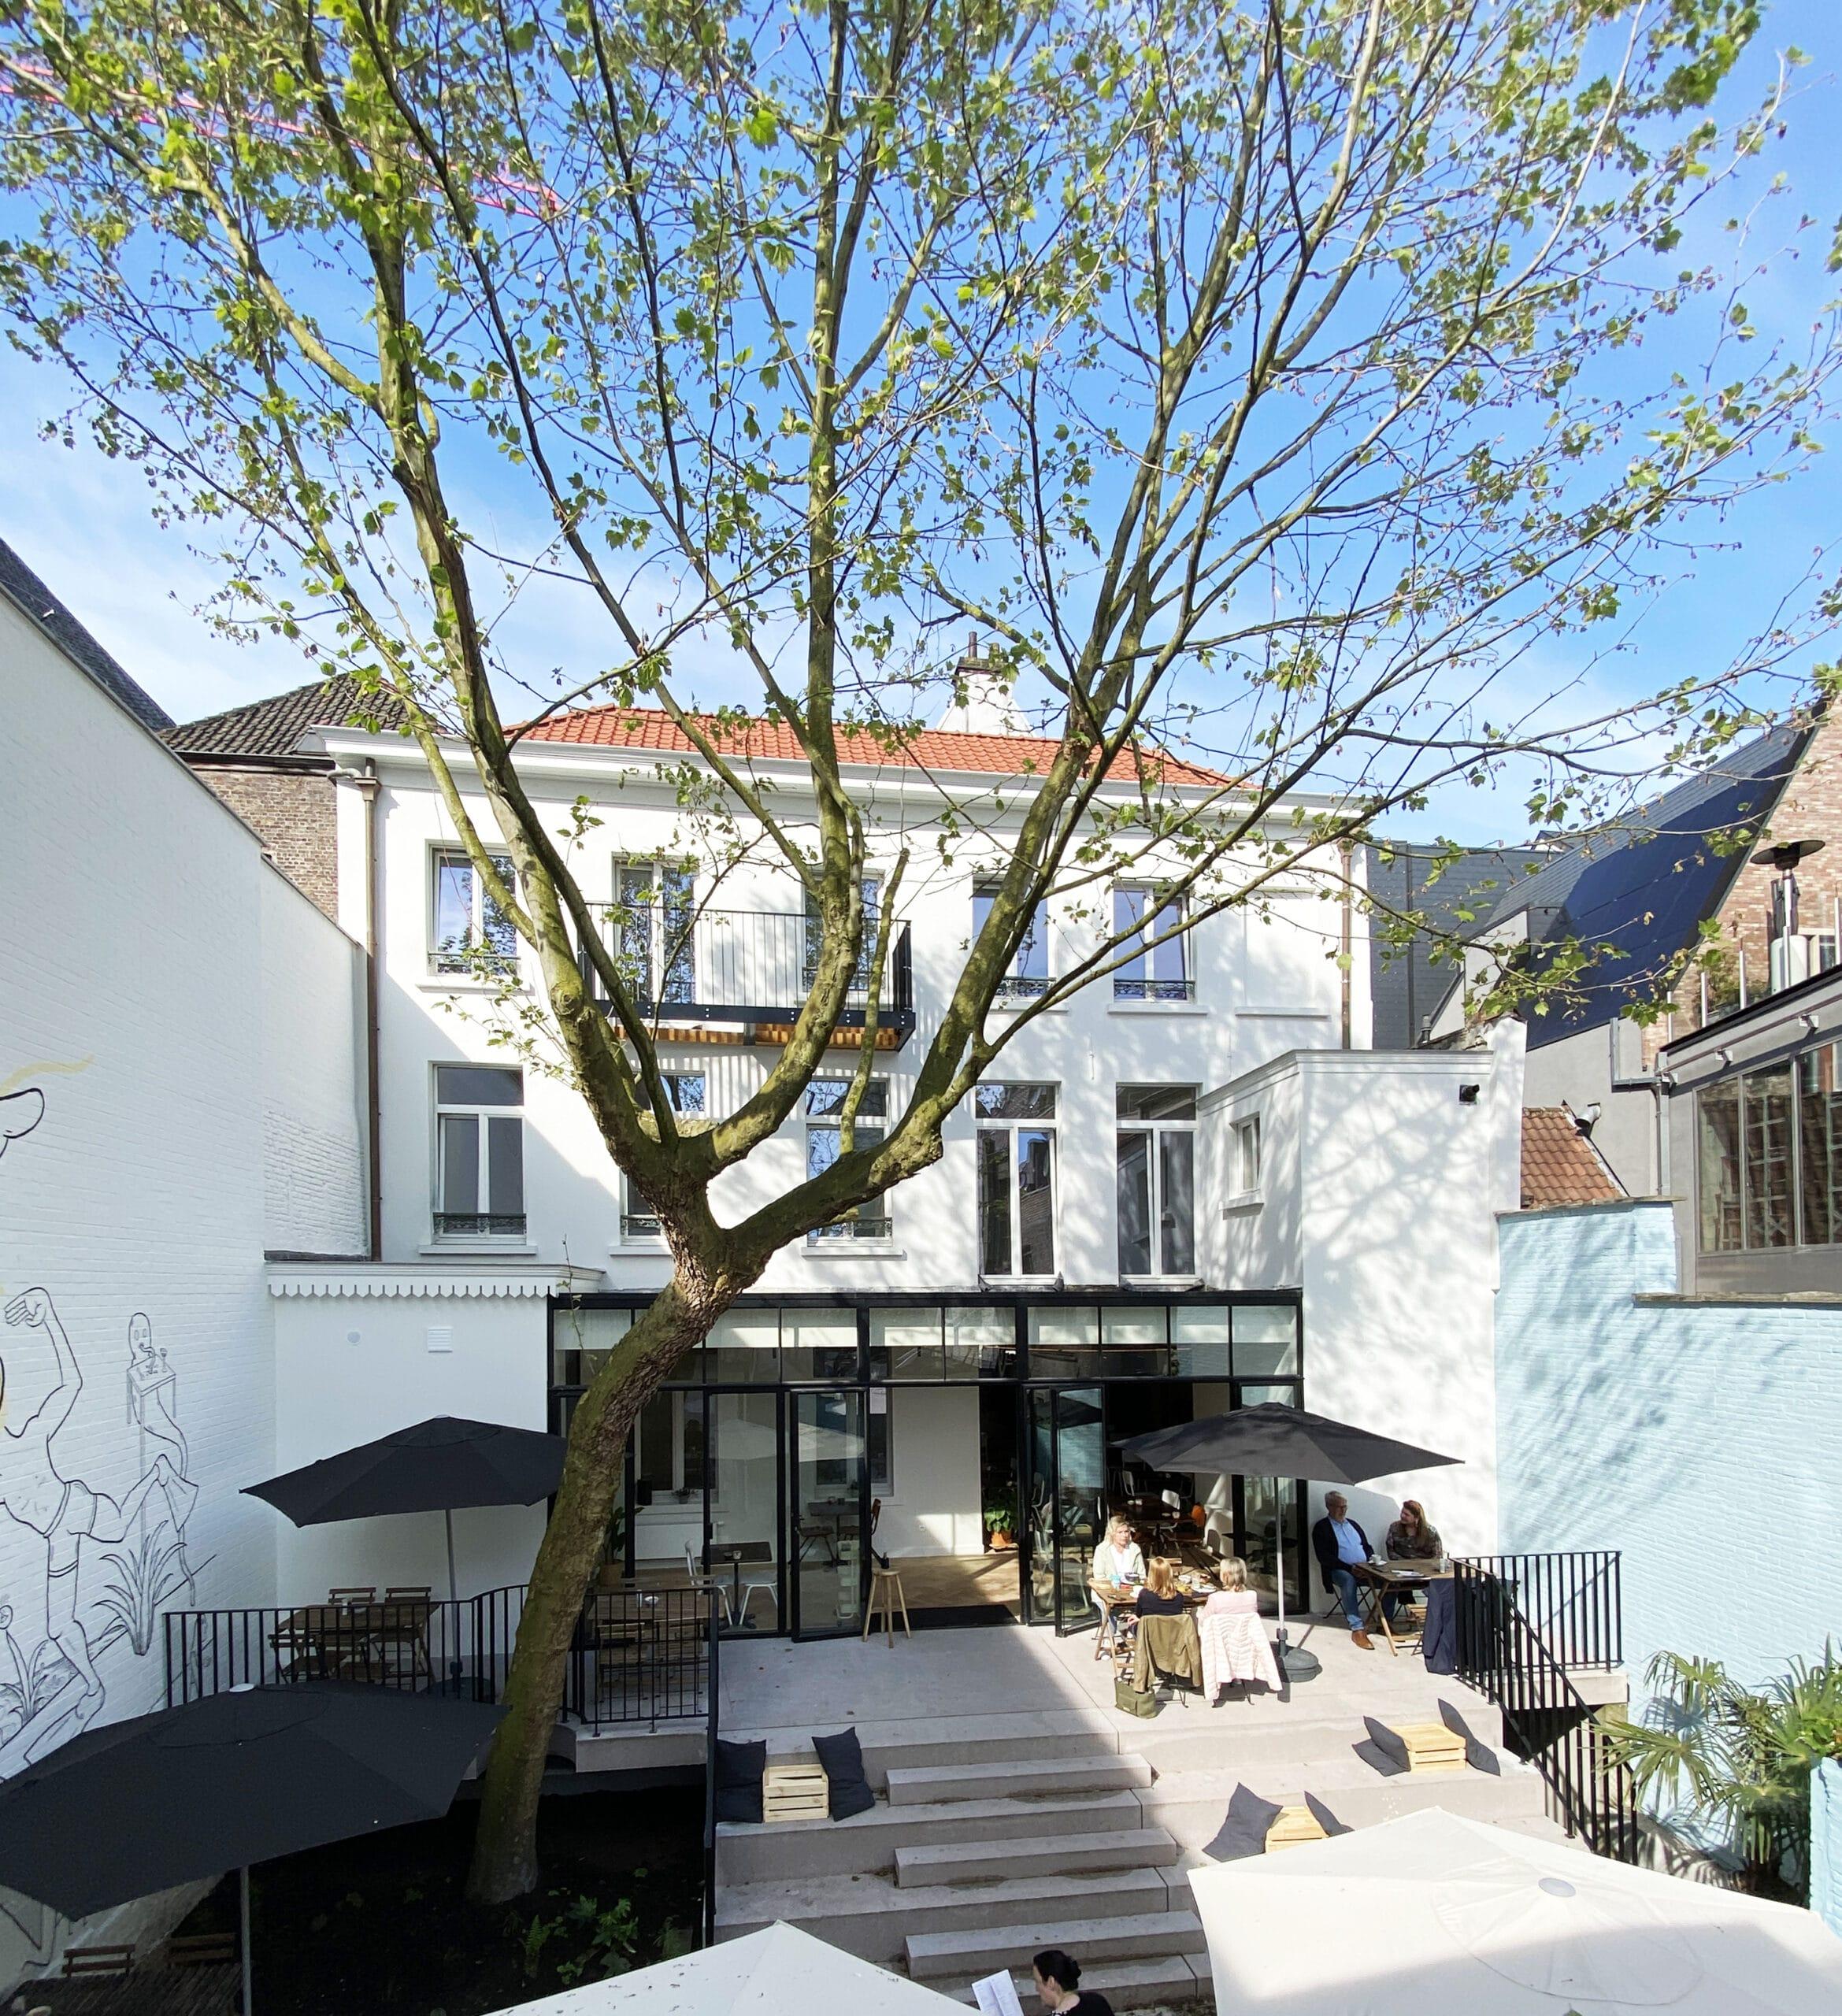 IMG 8181 2 scaled | Baeyens & Beck architecten Gent | architect nieuwbouw renovatie interieur | high end | architectenbureau